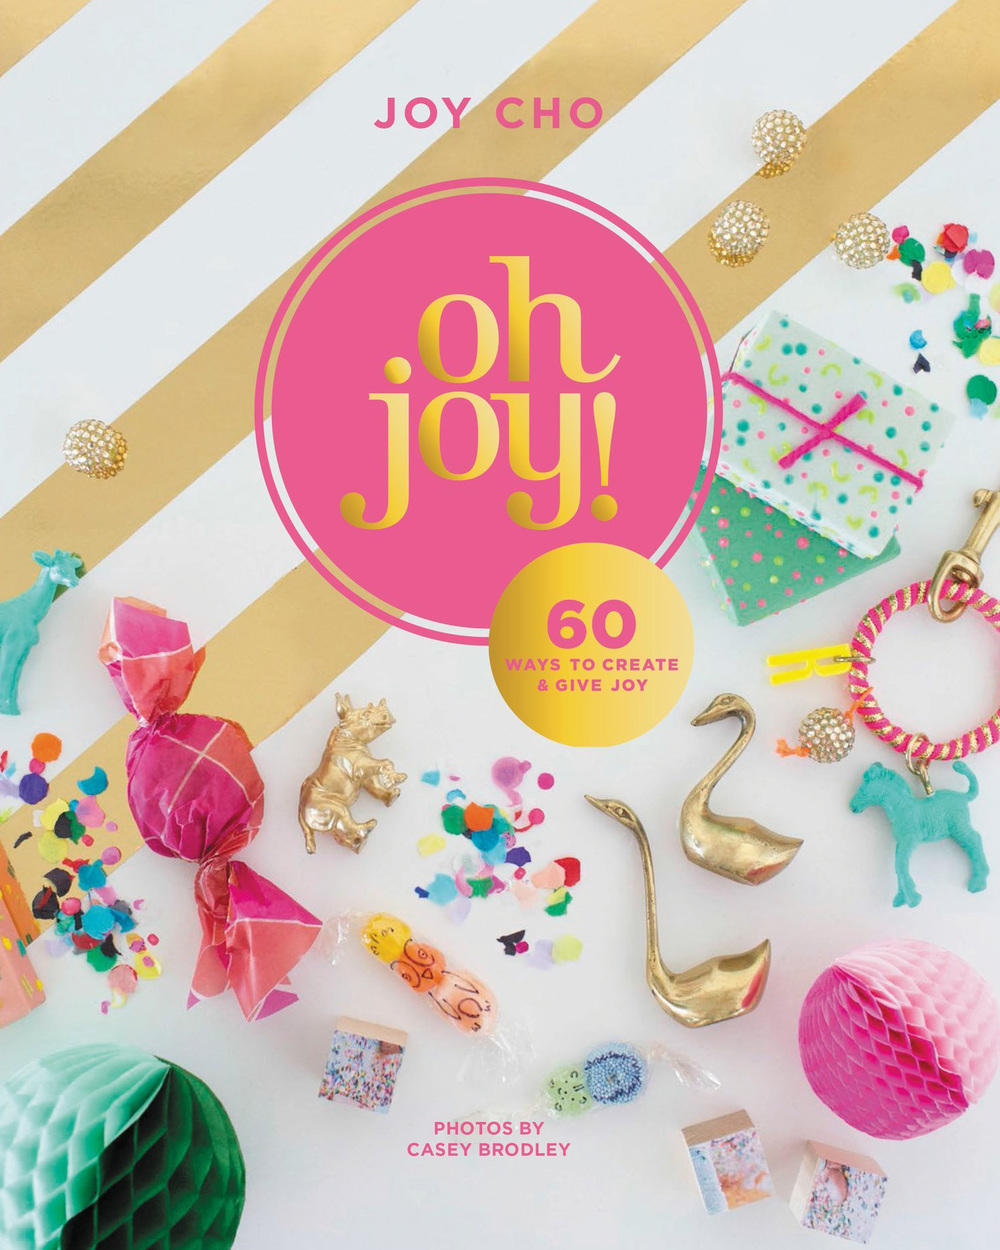 oh joy book cover.jpg